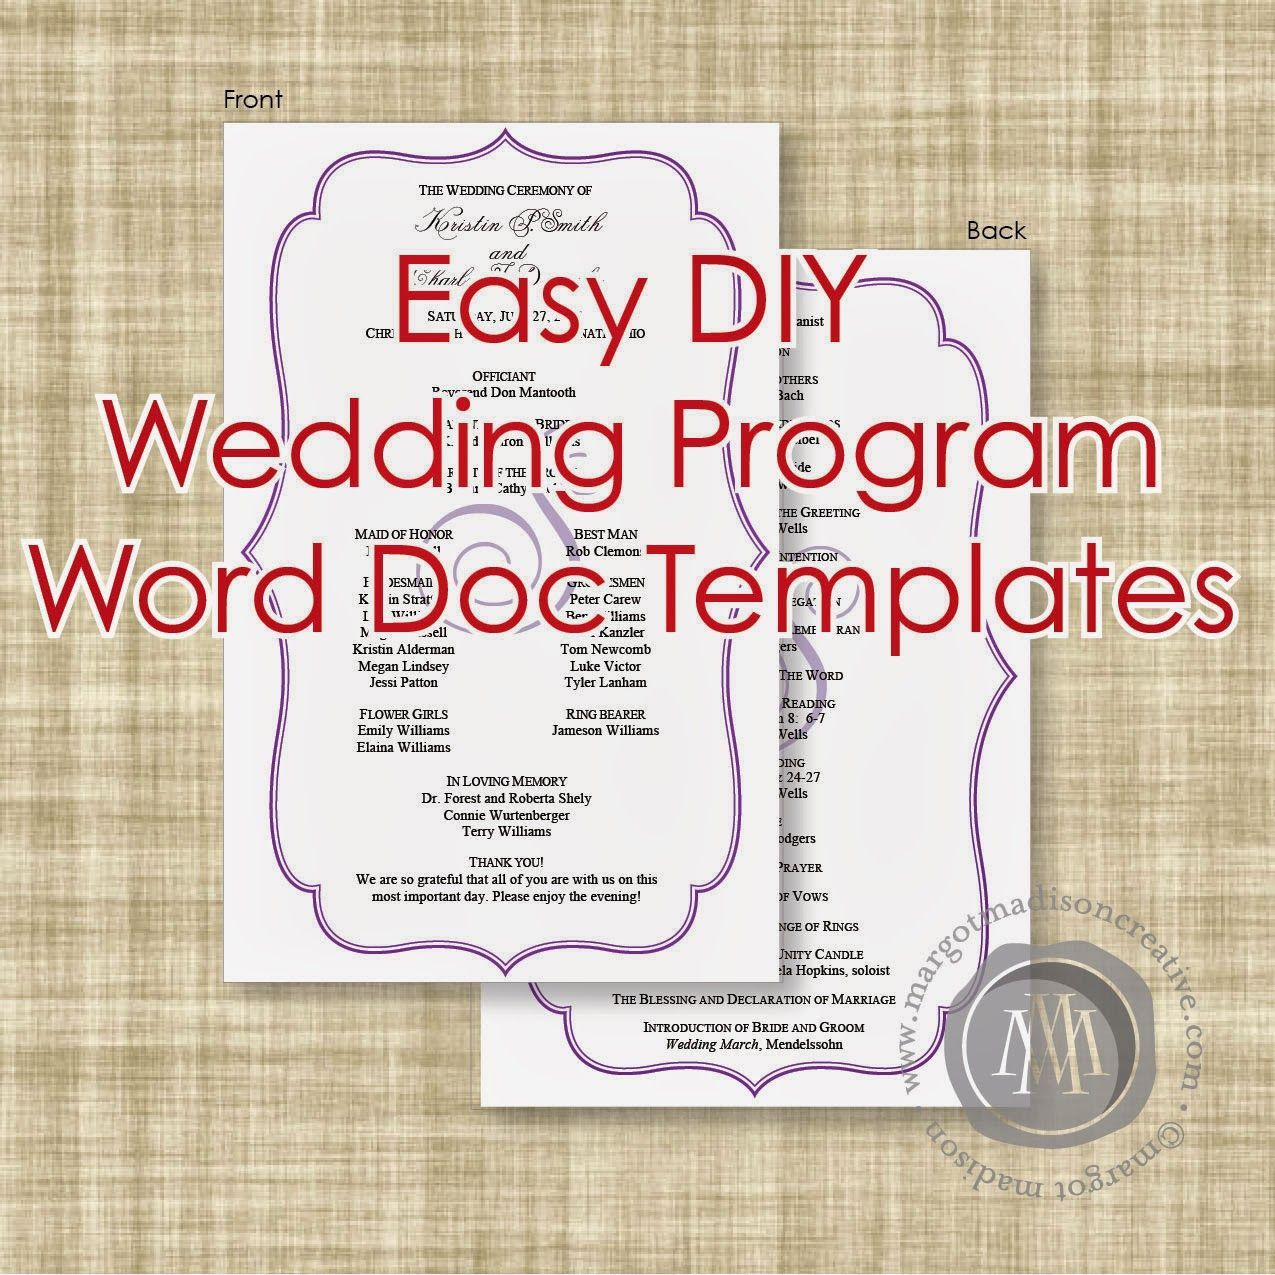 Word Wedding Program Template from www.addictionary.org